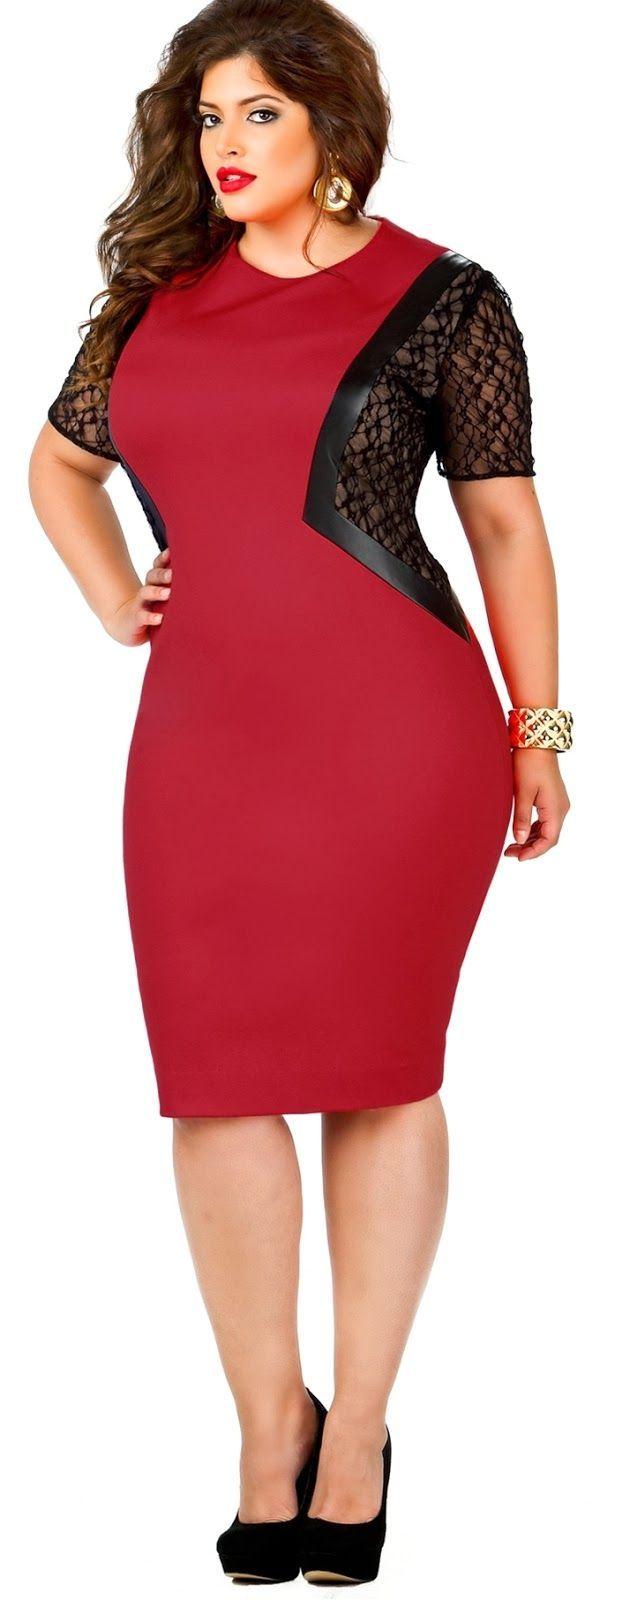 Plus Size Clothing for Women | Dresses | Lingerie | Shoes | OneStopPlus.com